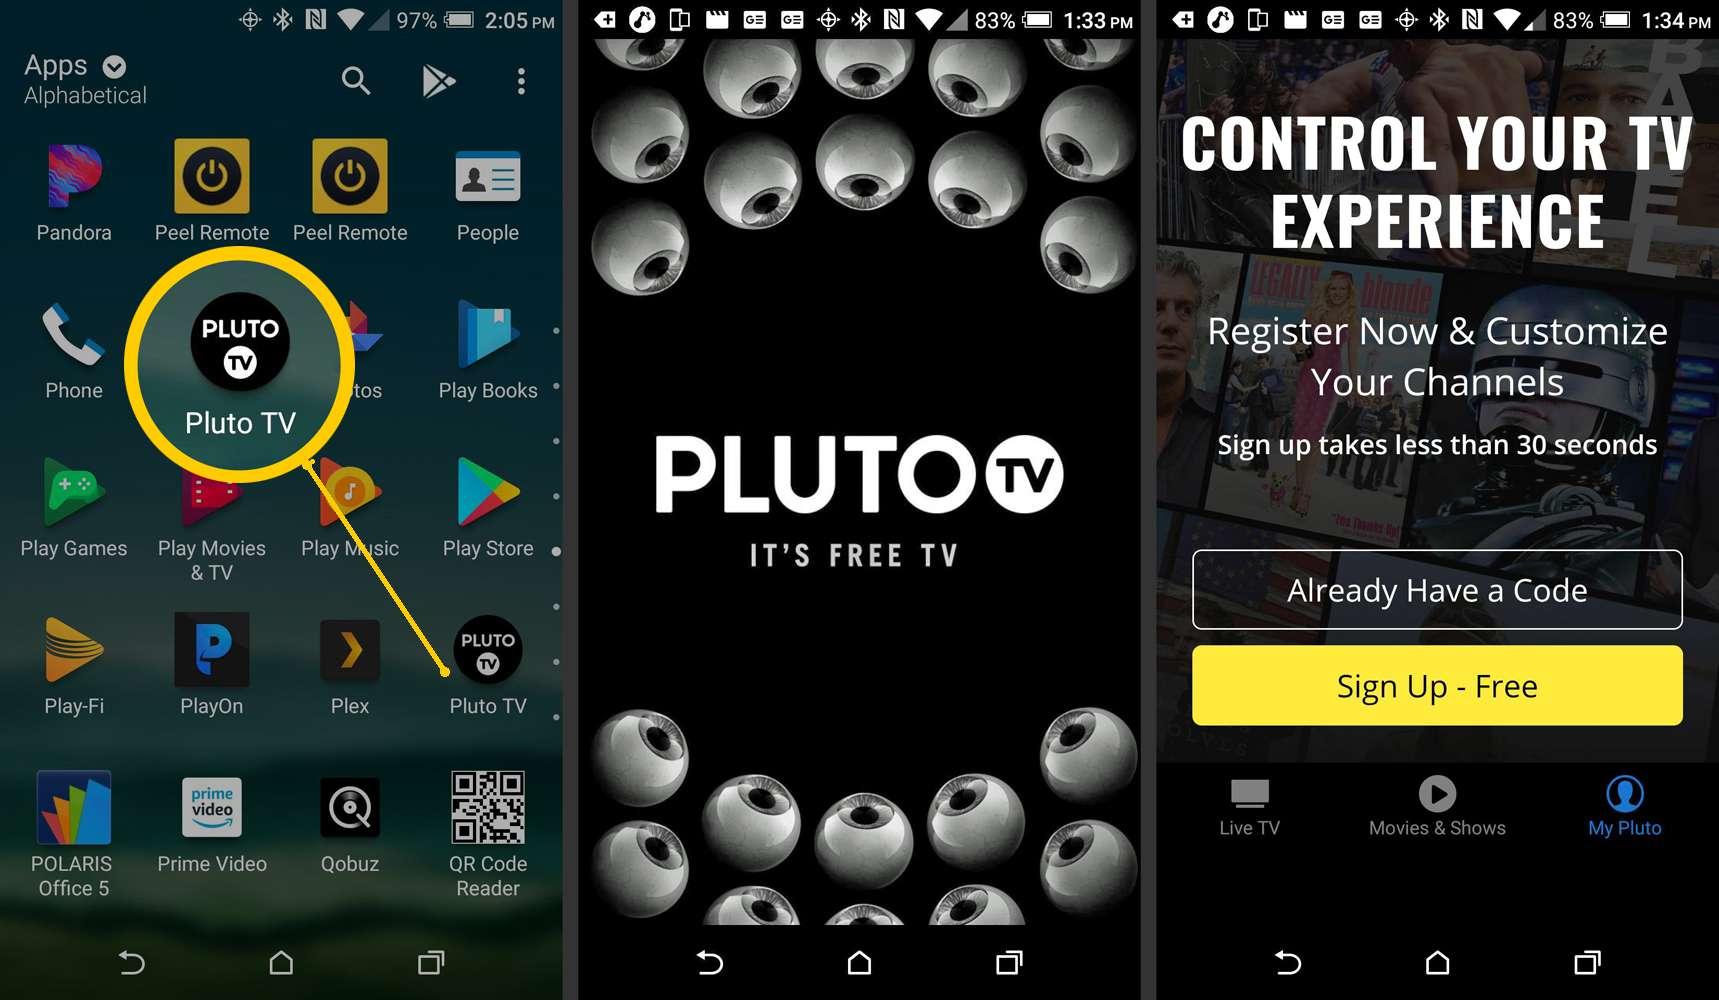 Pluto TV Smartphone App – Sign-Up